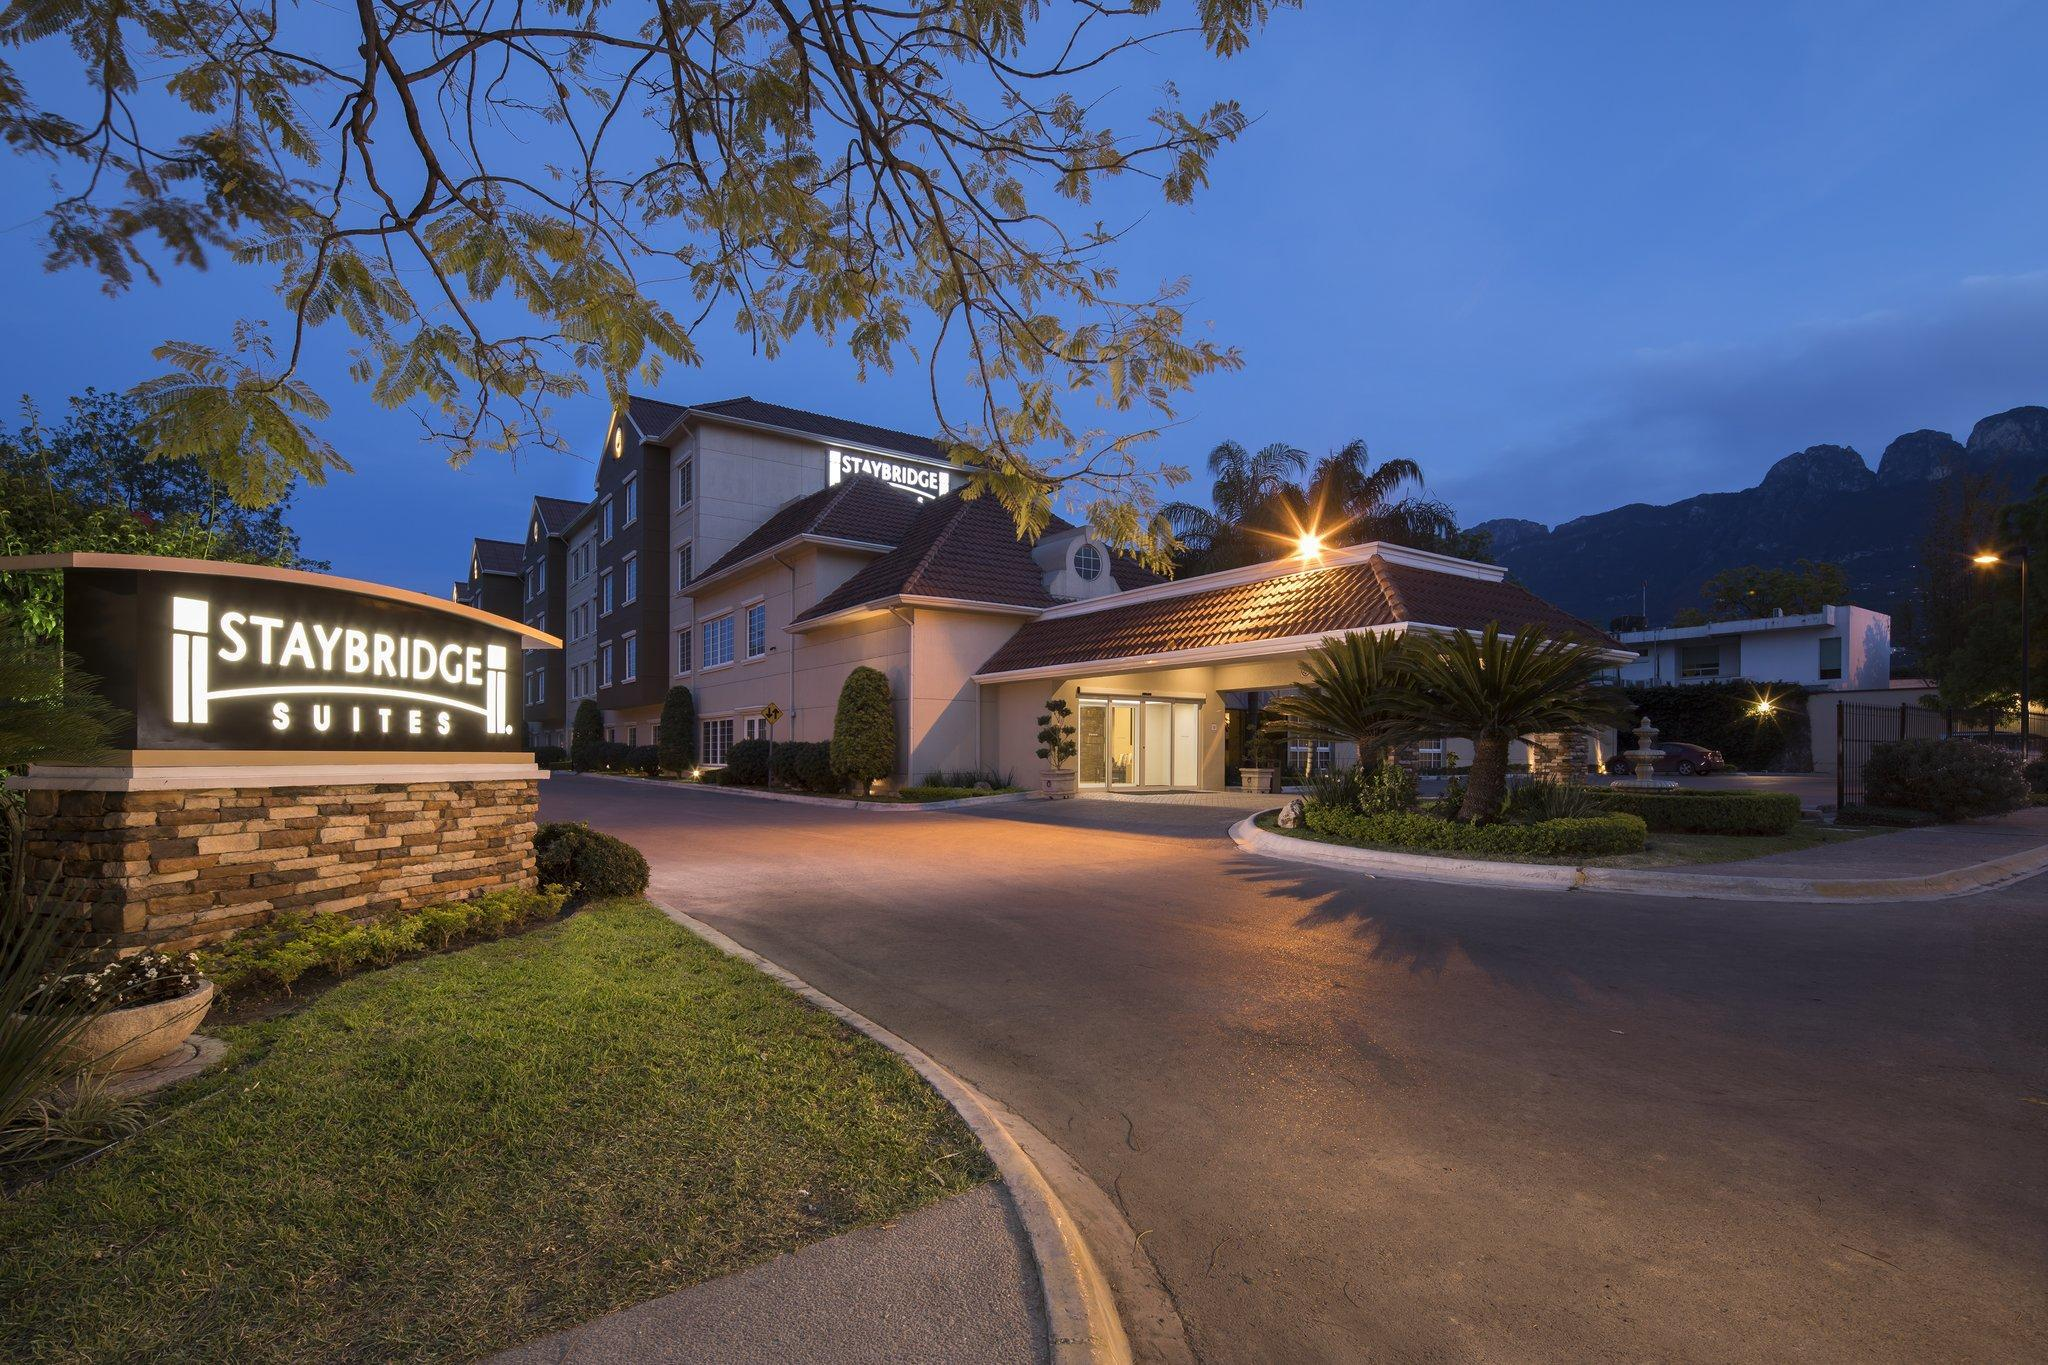 Staybridge Suites Monterrey San Pedro